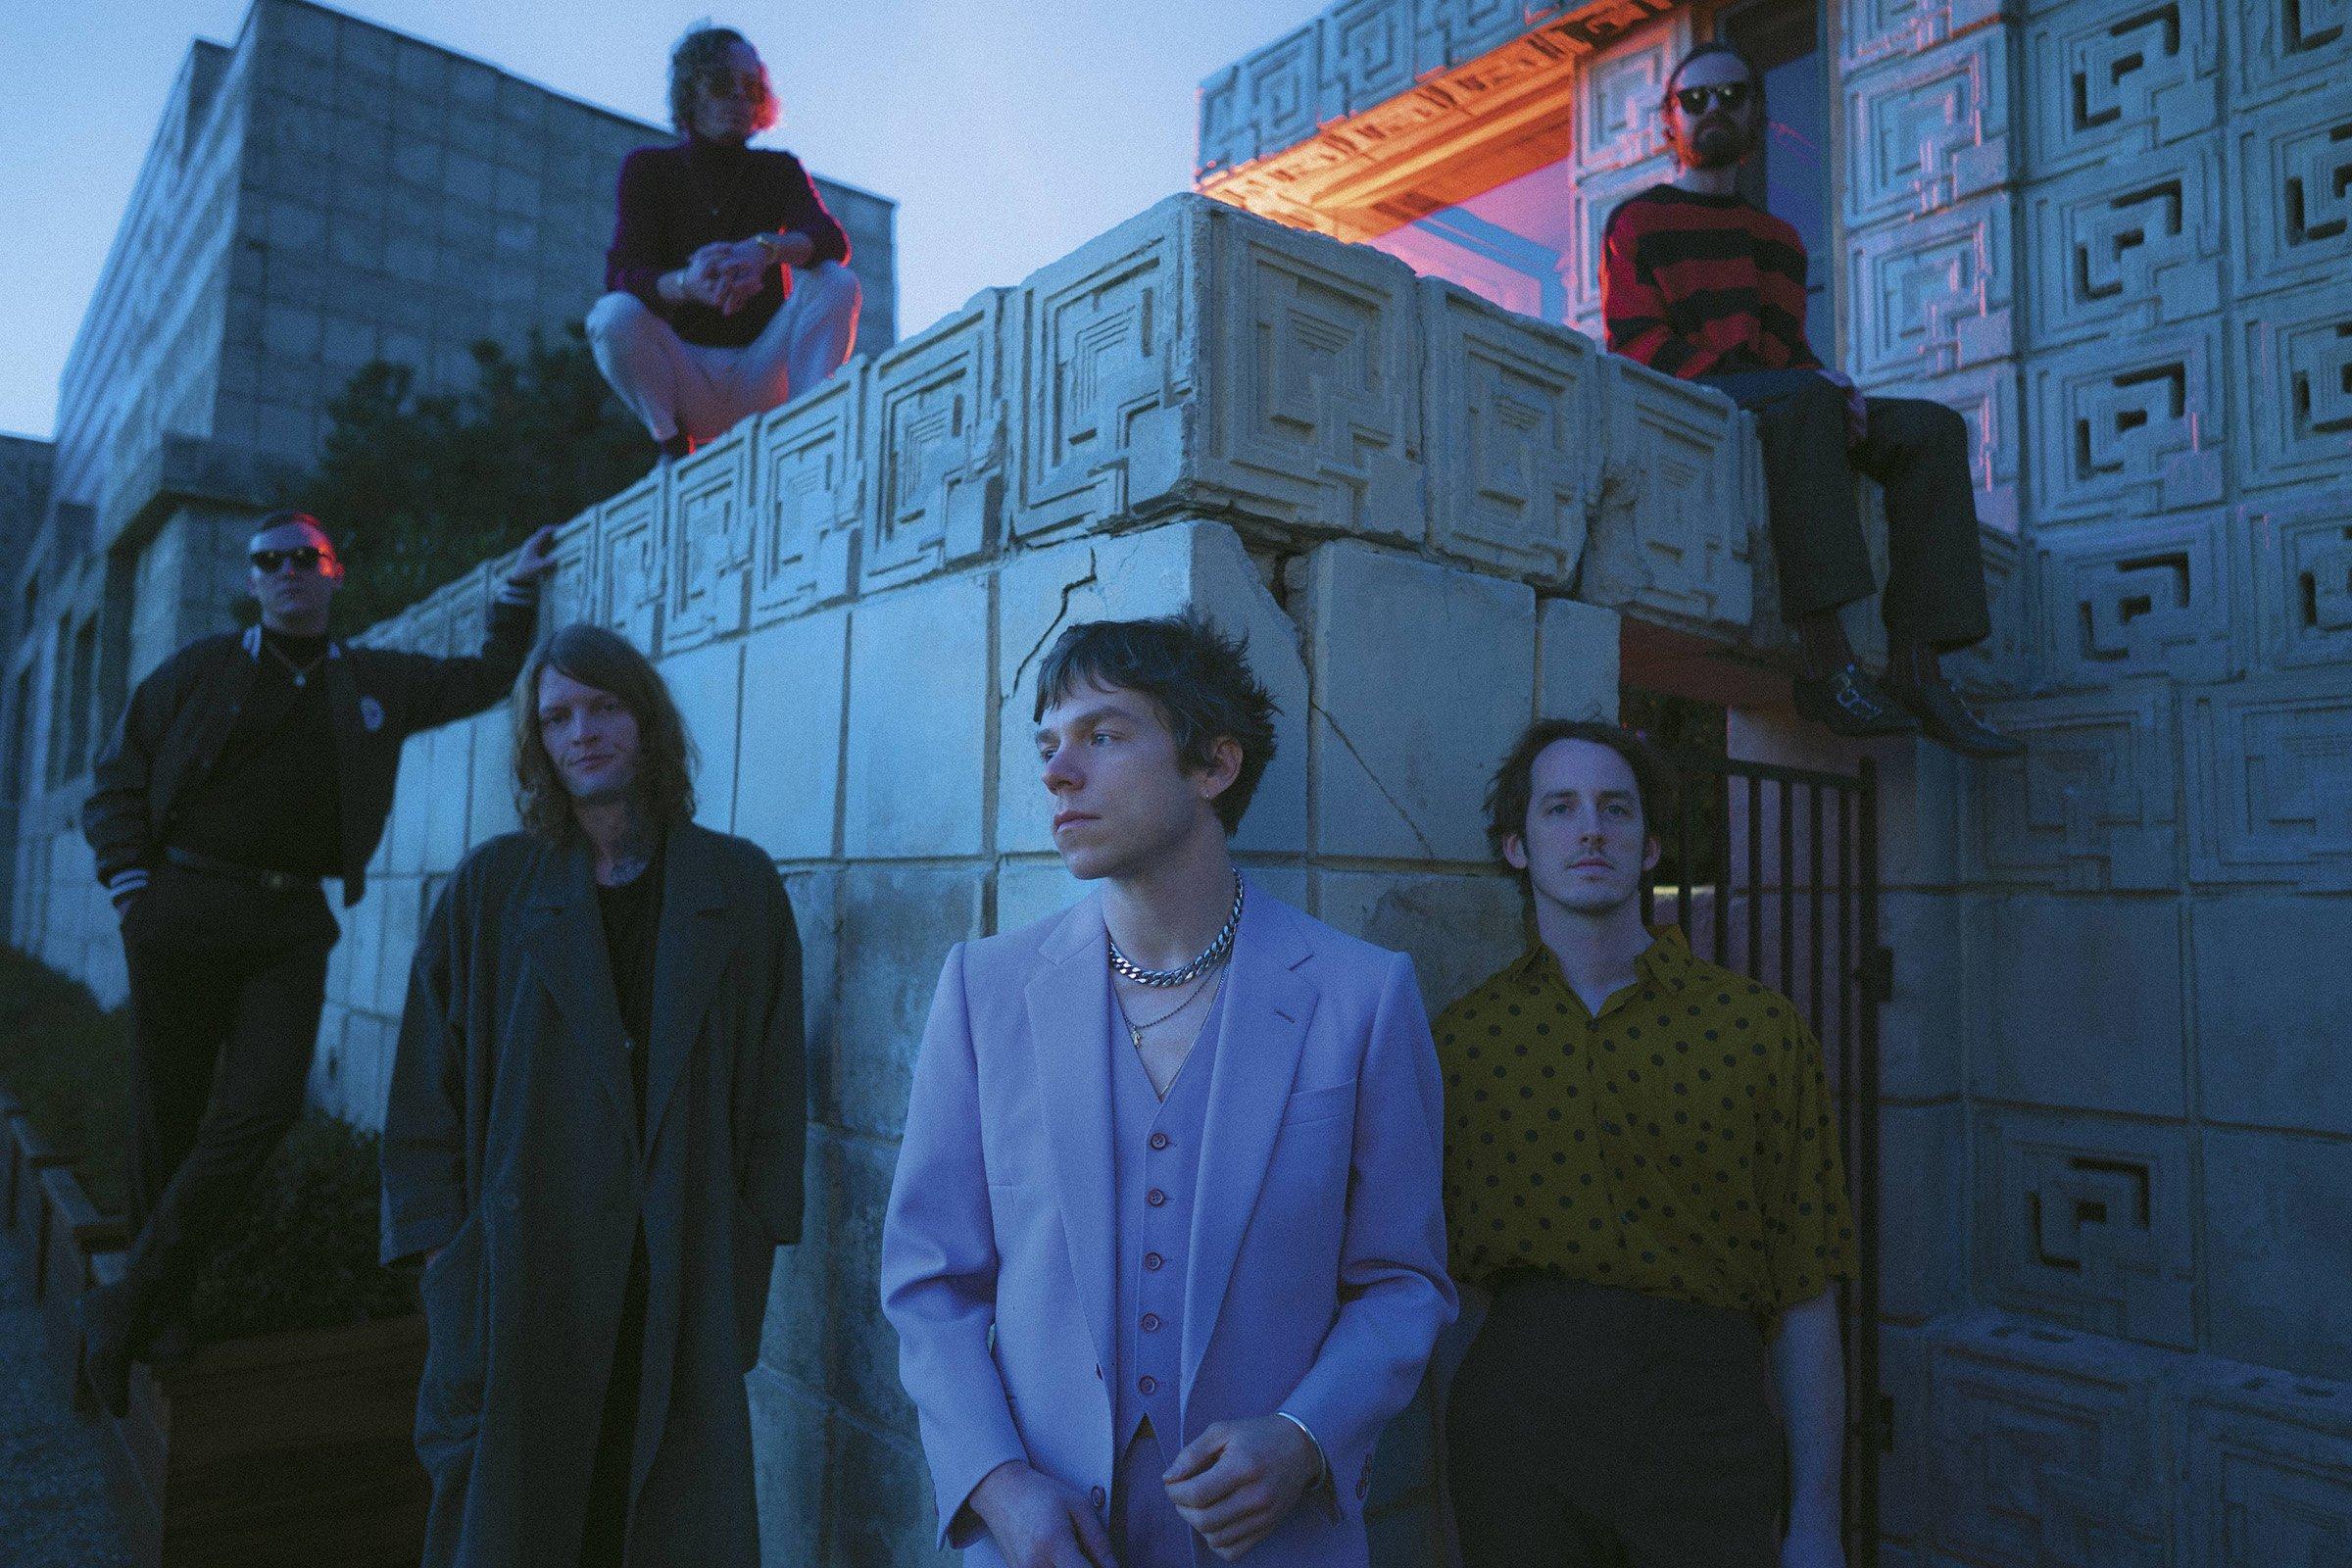 CAGE THE ELEPHANT Debut 'Broken Boy' Featuring IGGY POP - Listen Now